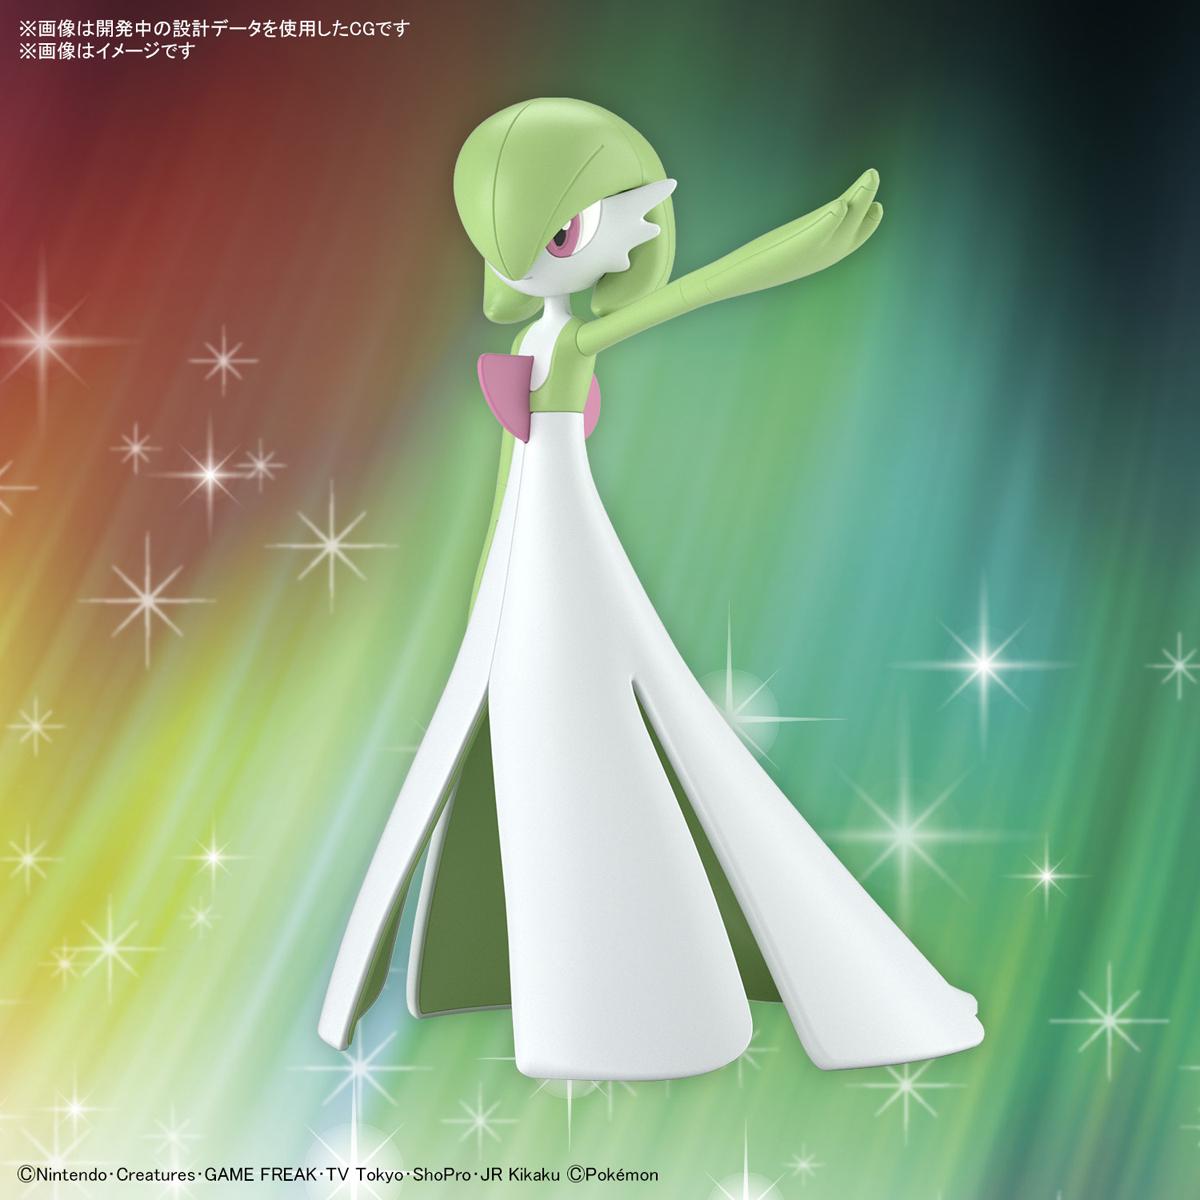 Pokémon PLAMO 收藏集 49 精選系列 沙奈朵